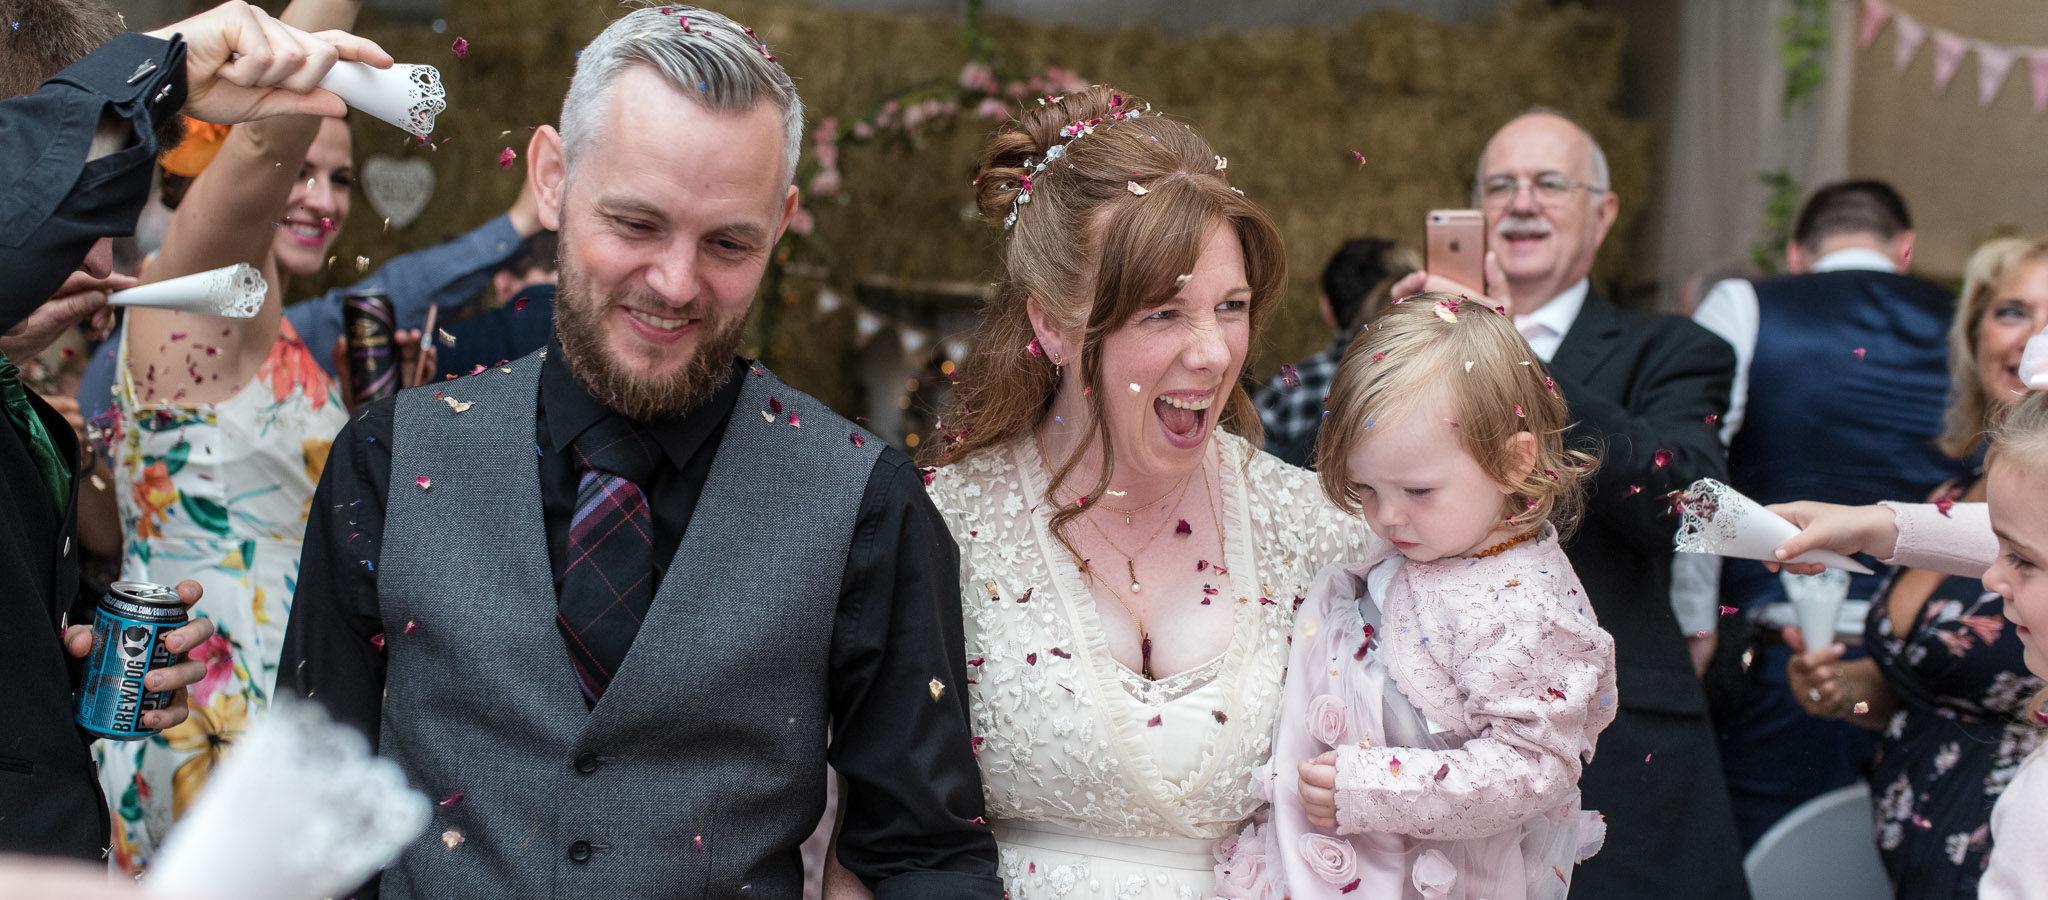 Confetti photo - aberdeen wedding photographer - debbie dee photography